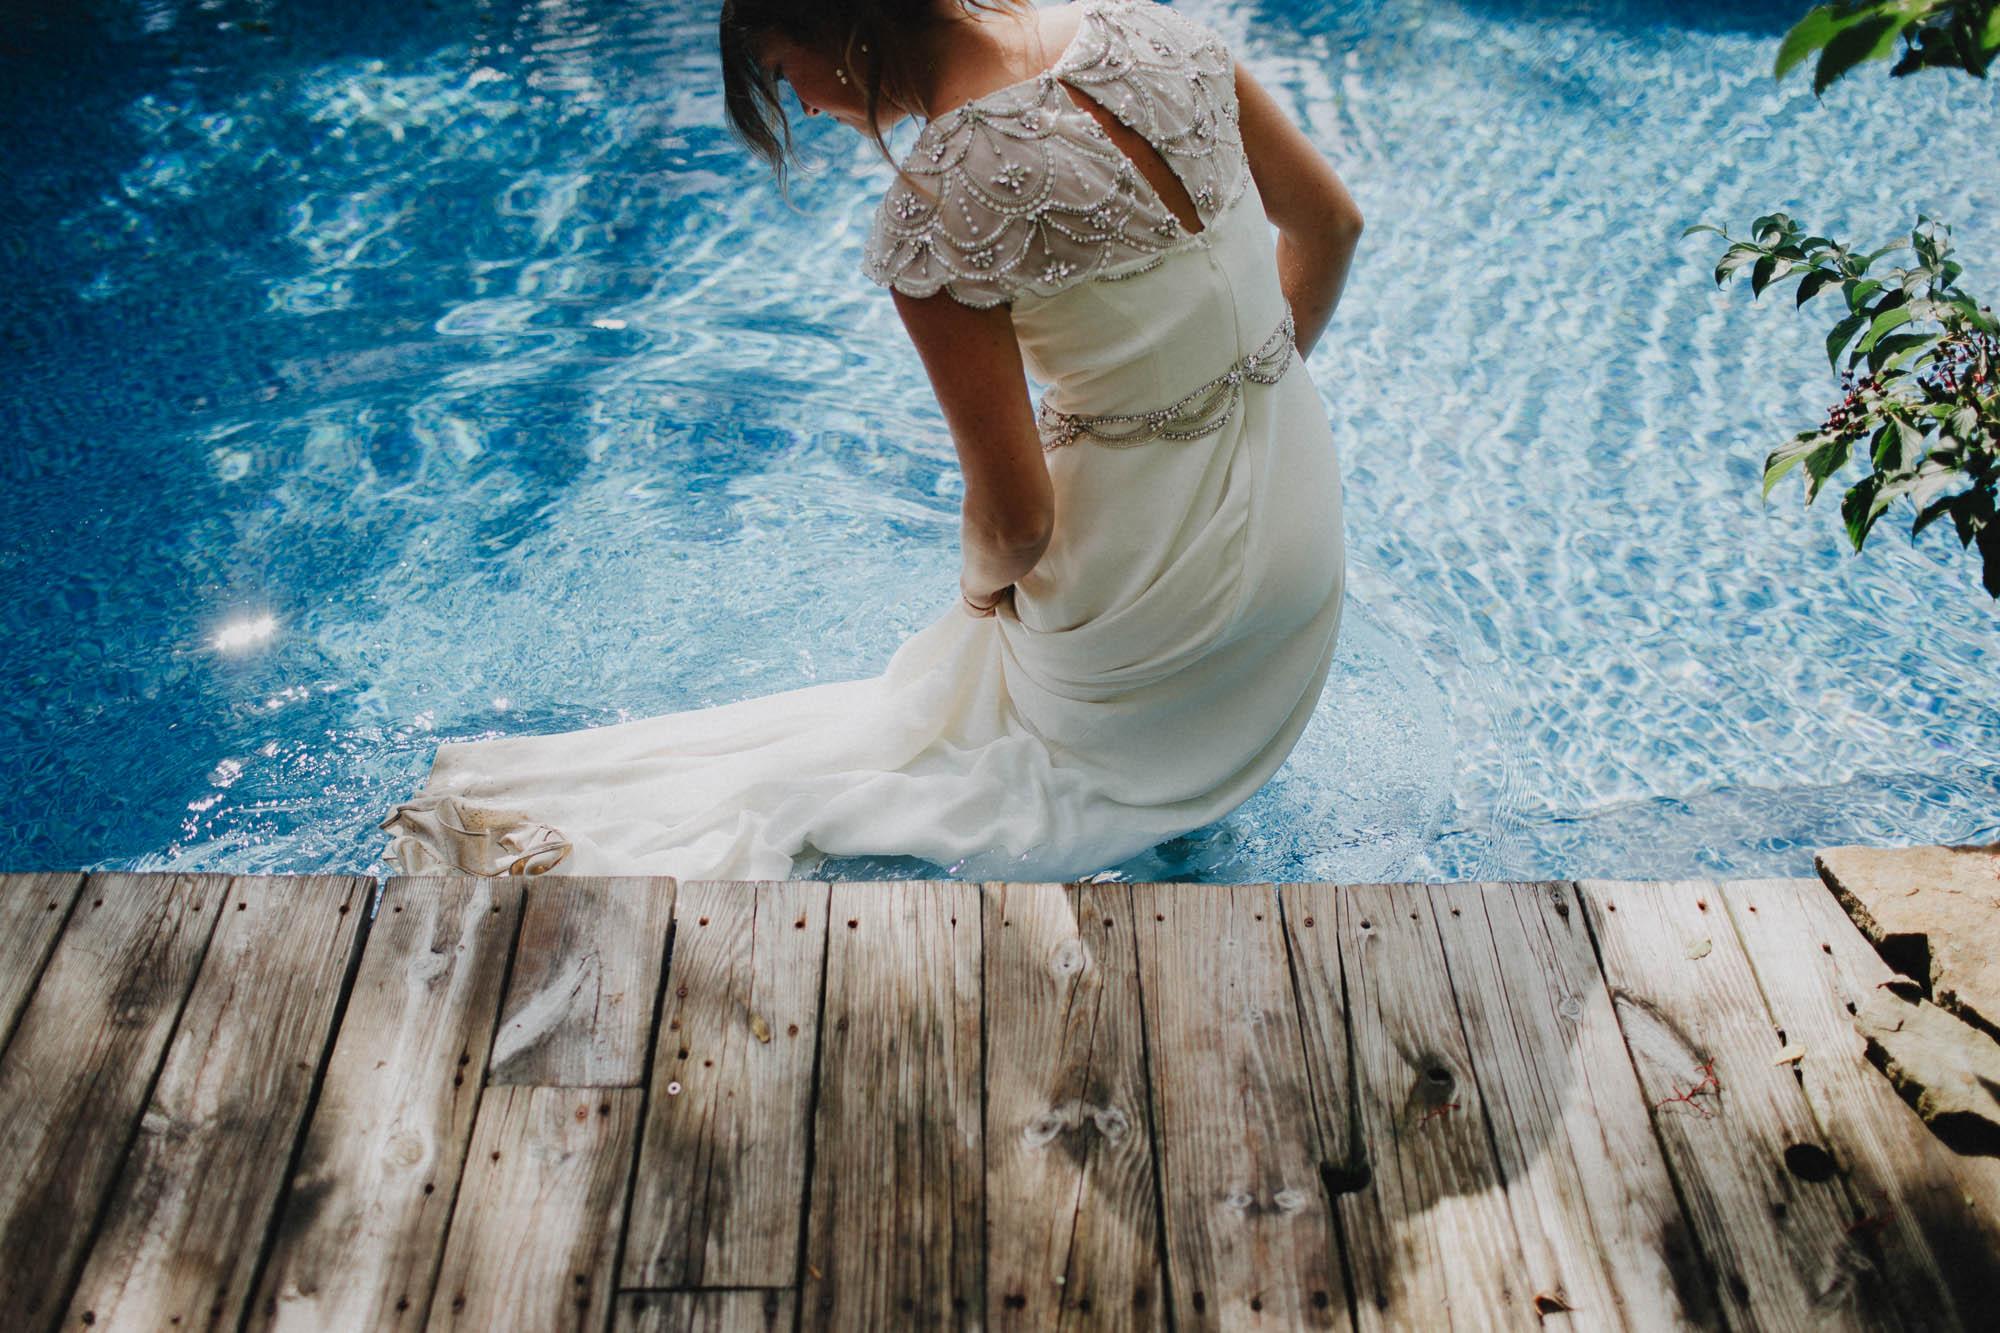 Leah-Graham-Michigan-Outdoor-DIY-Wedding-092@2x.jpg